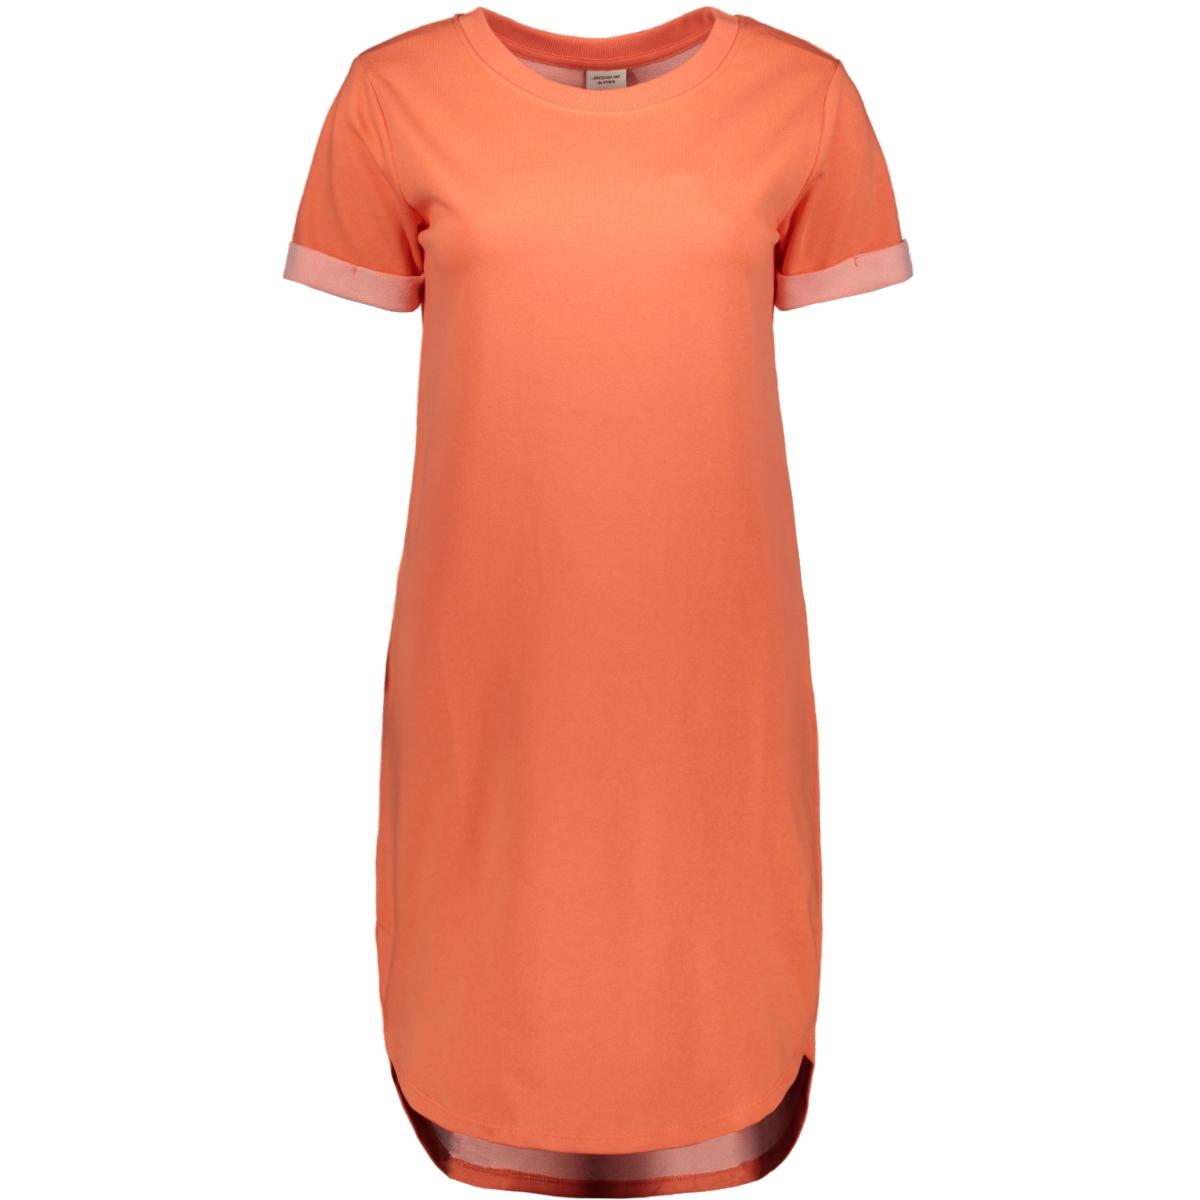 jdyivy life s/s dress jrs noos 15174793 jacqueline de yong jurk living coral